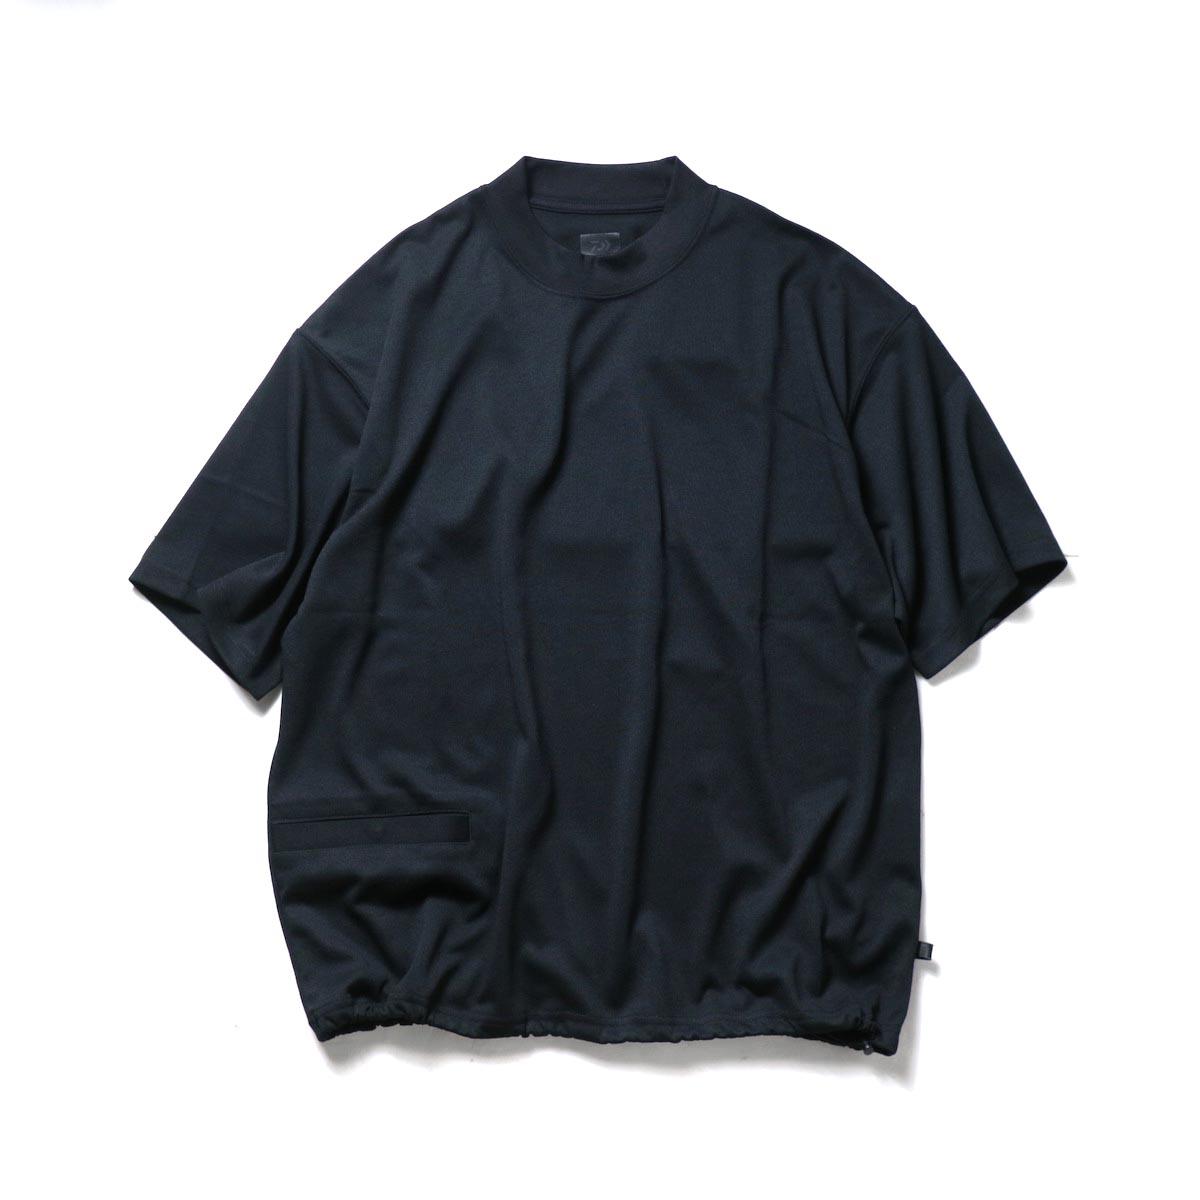 DAIWA PIER39 / Tech 1P Hi-Crew NeckT-Shirts (Black)